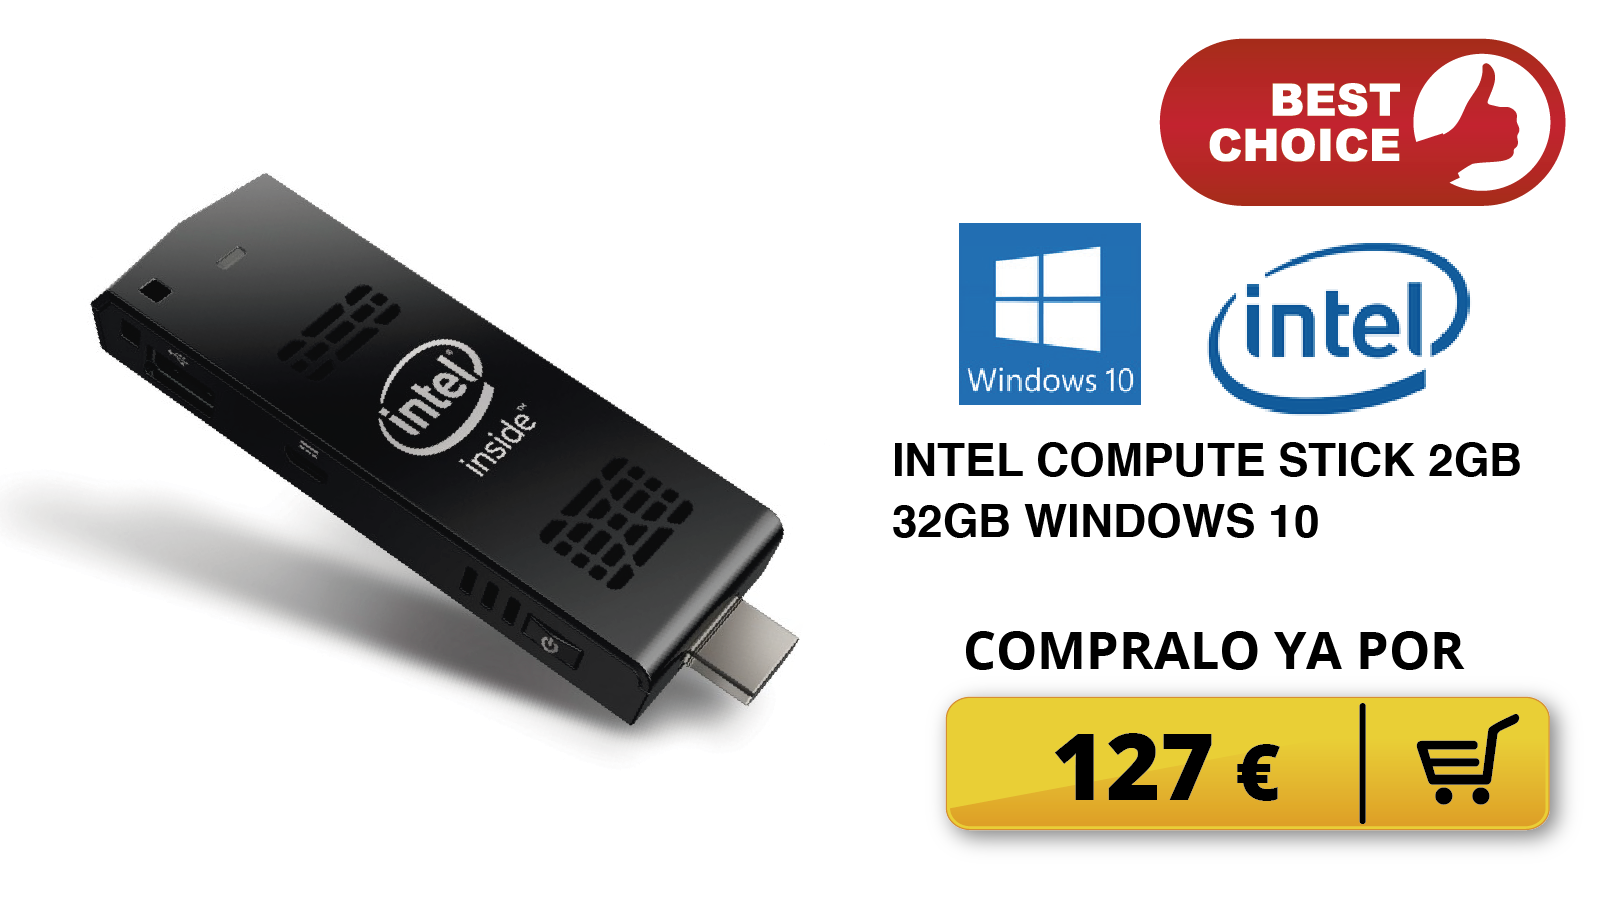 INTEL COMPUTE STICK 2GB 32GB WINDOWS 10